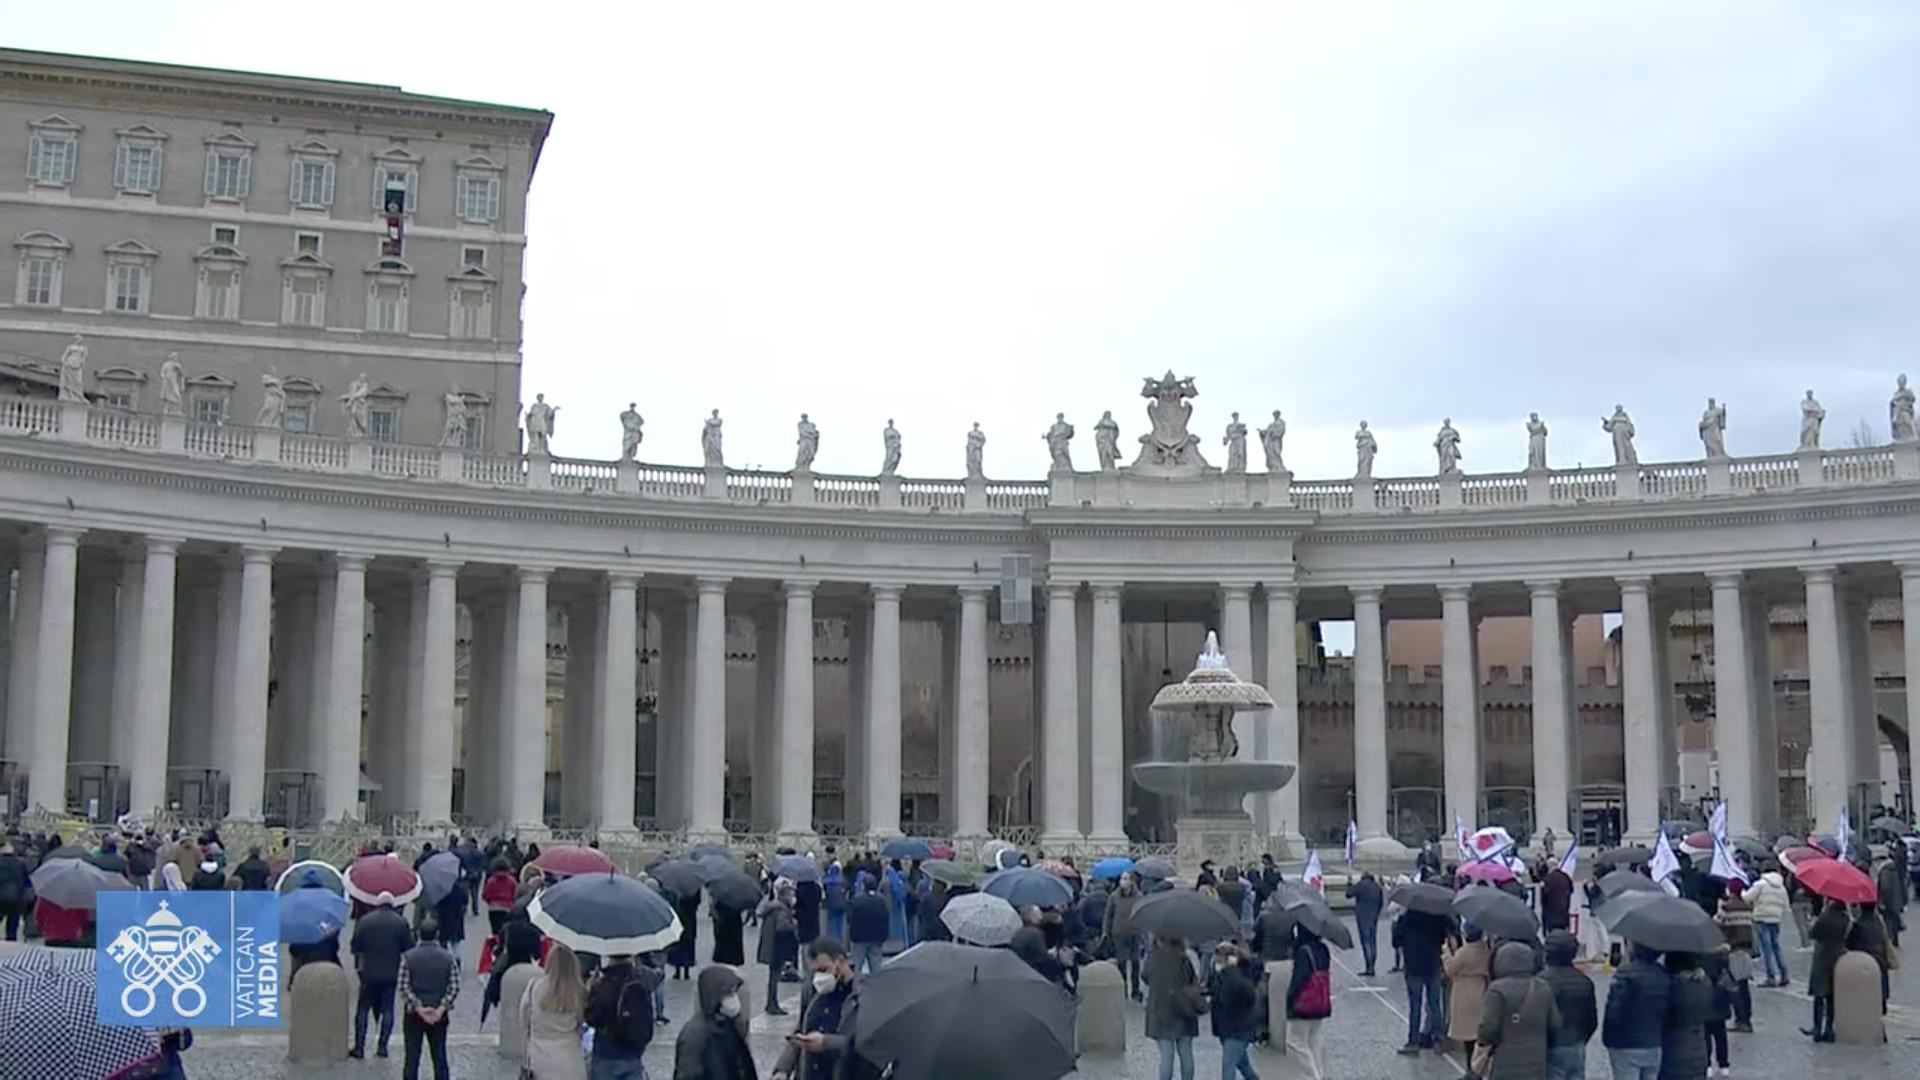 Angélus, 7 fév. 2021, capture de Zenit @ Vatican Media